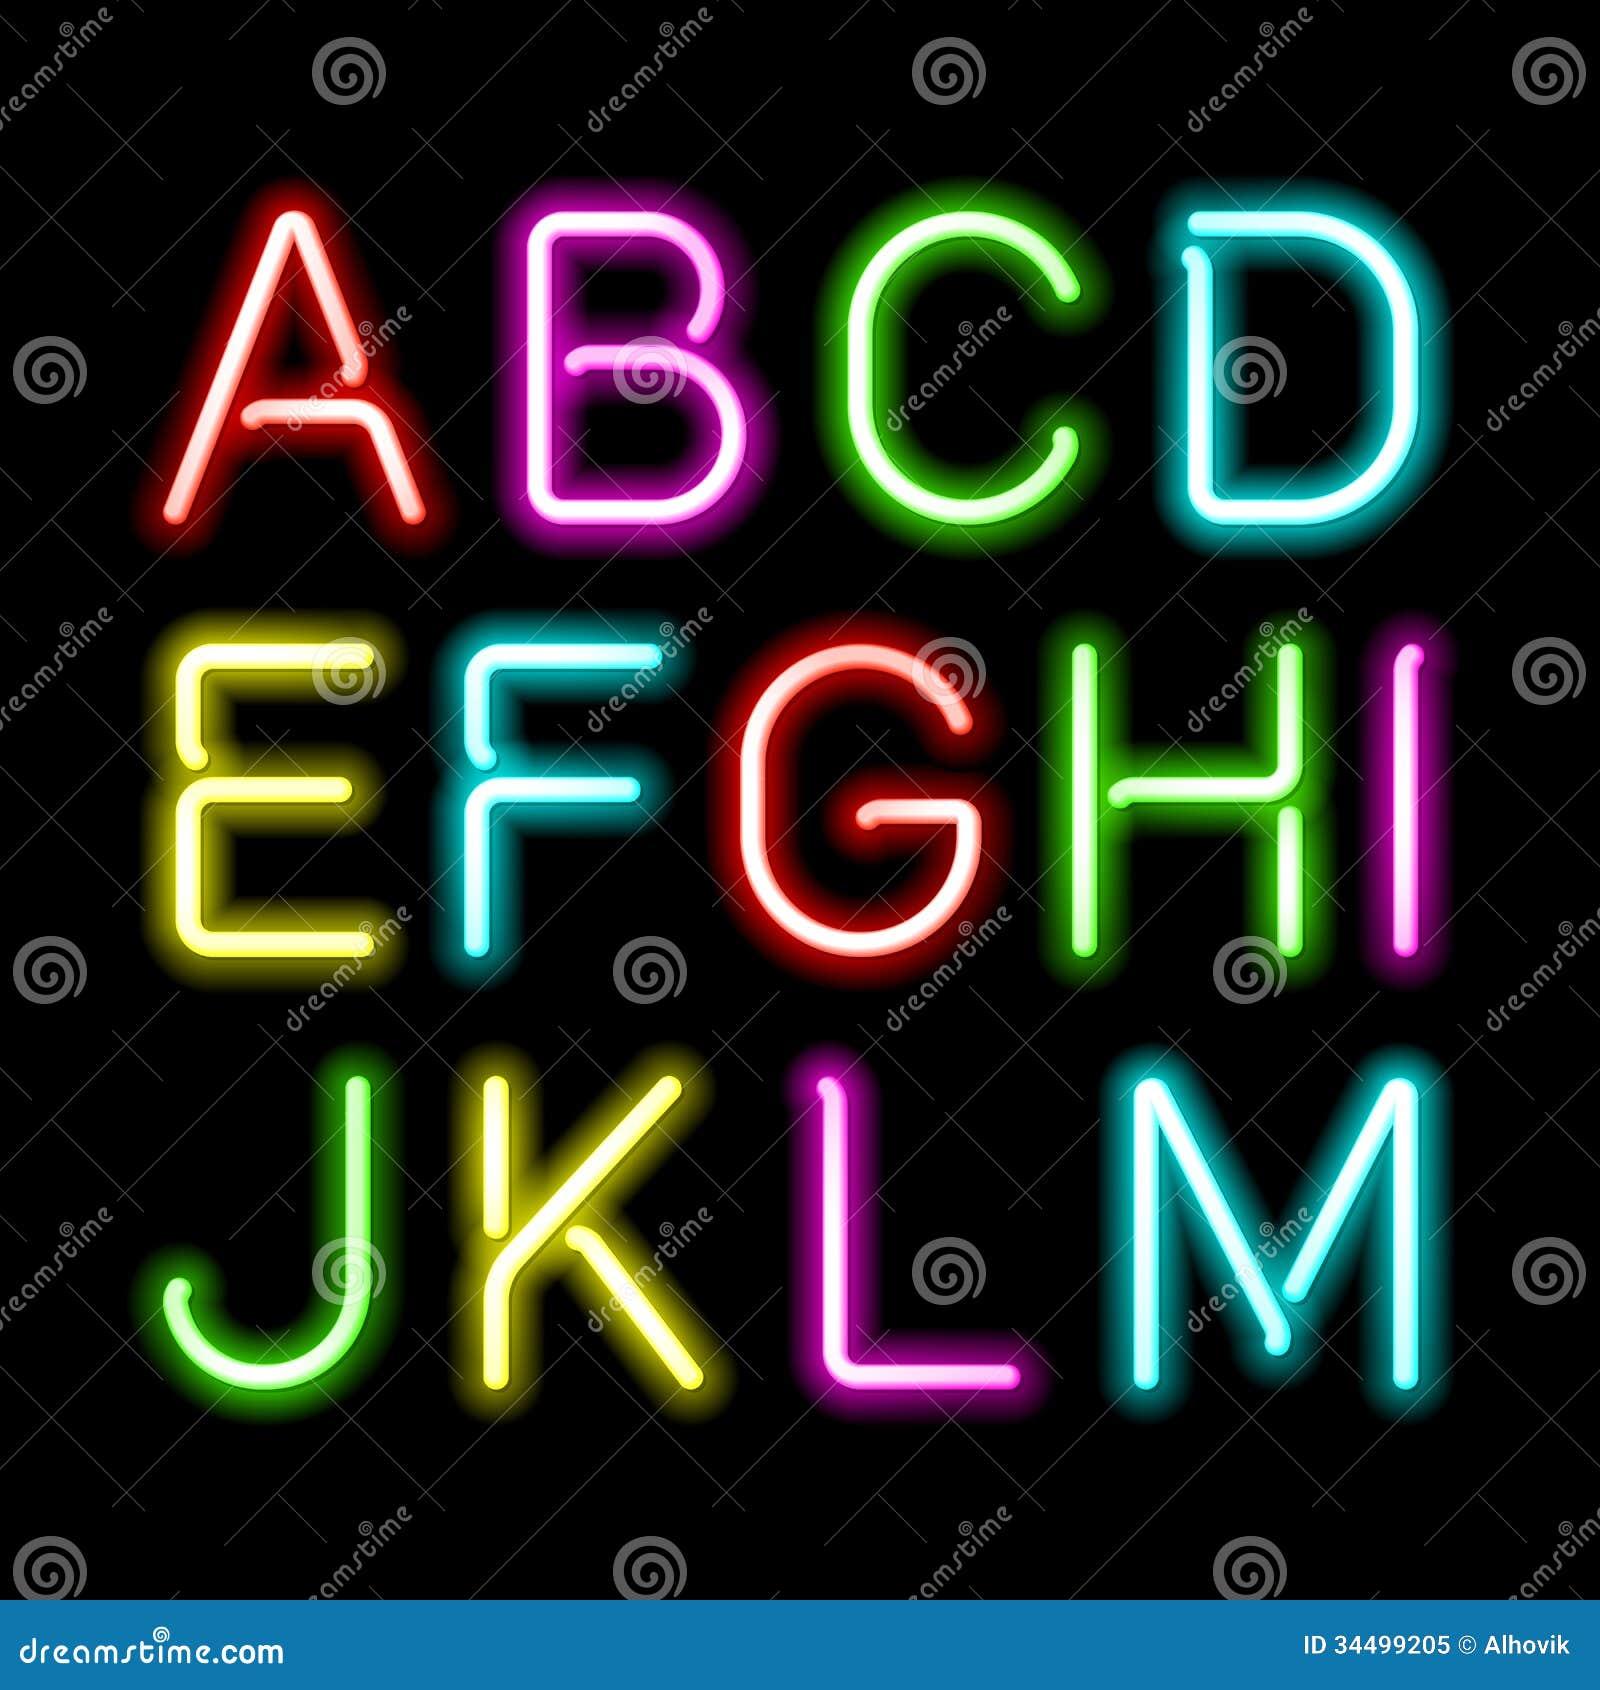 Neon Glow Alphabet Royalty Free Stock Photo Image 34499205